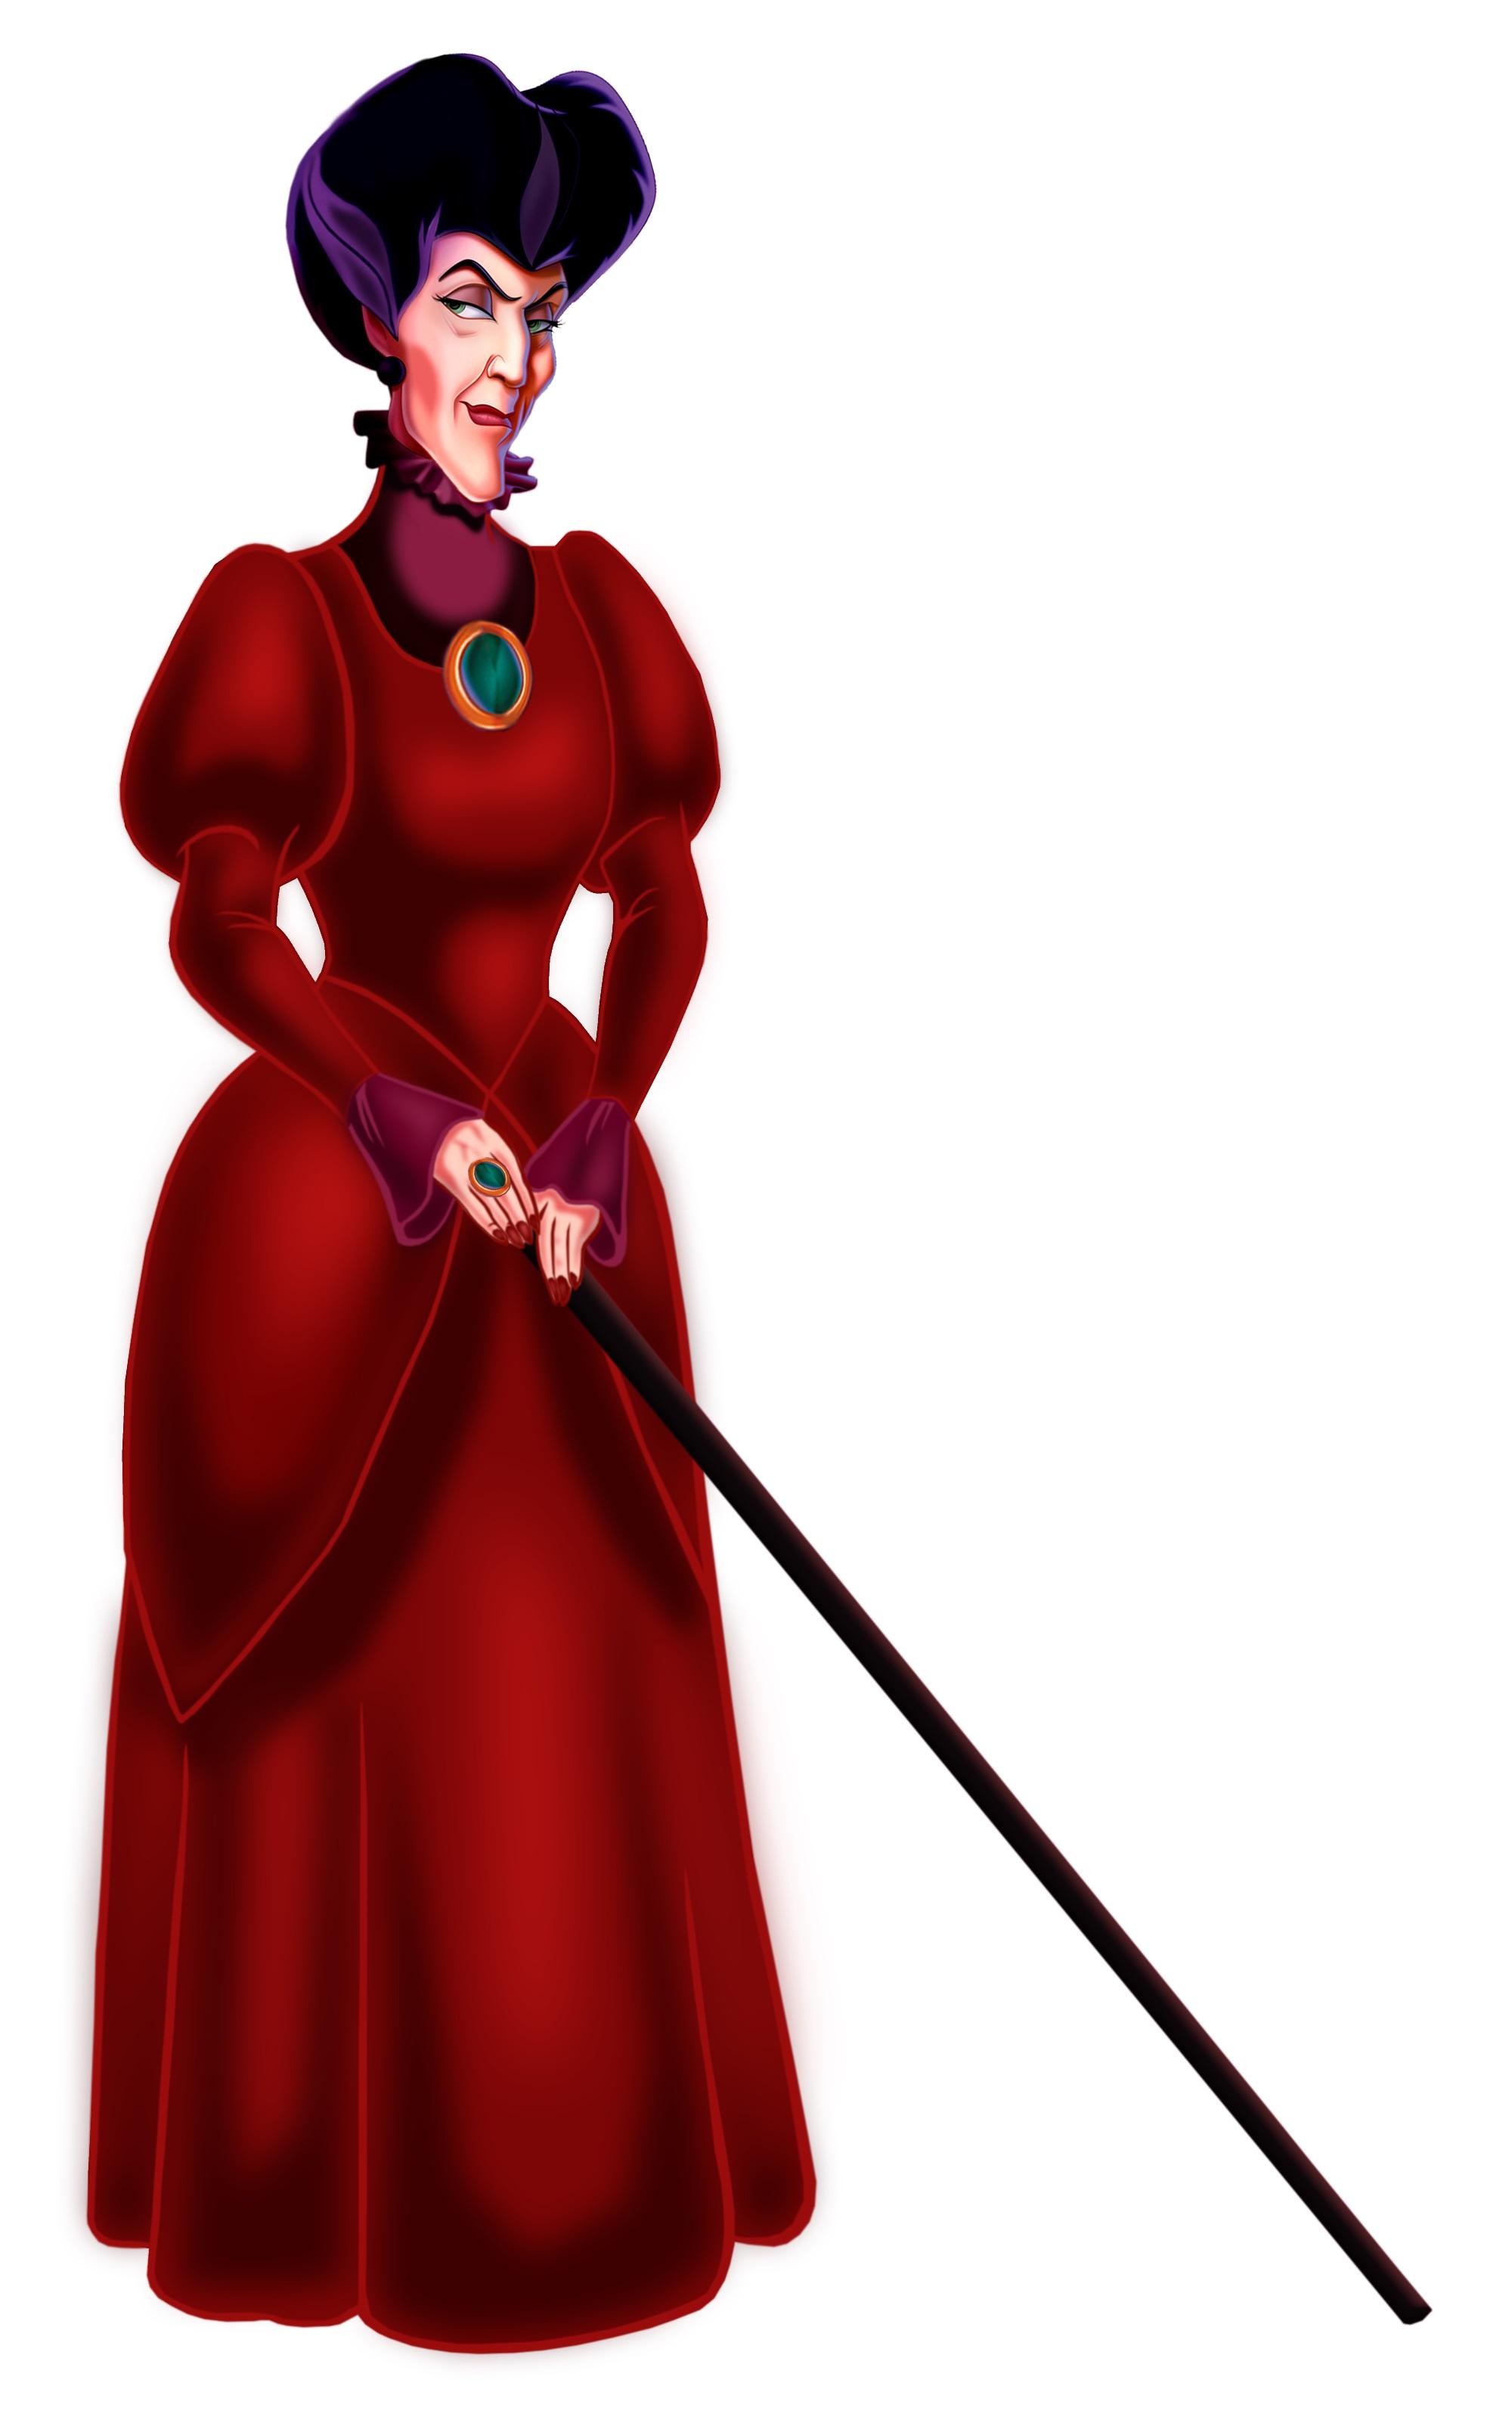 Lady Tremaine (Cinderella)